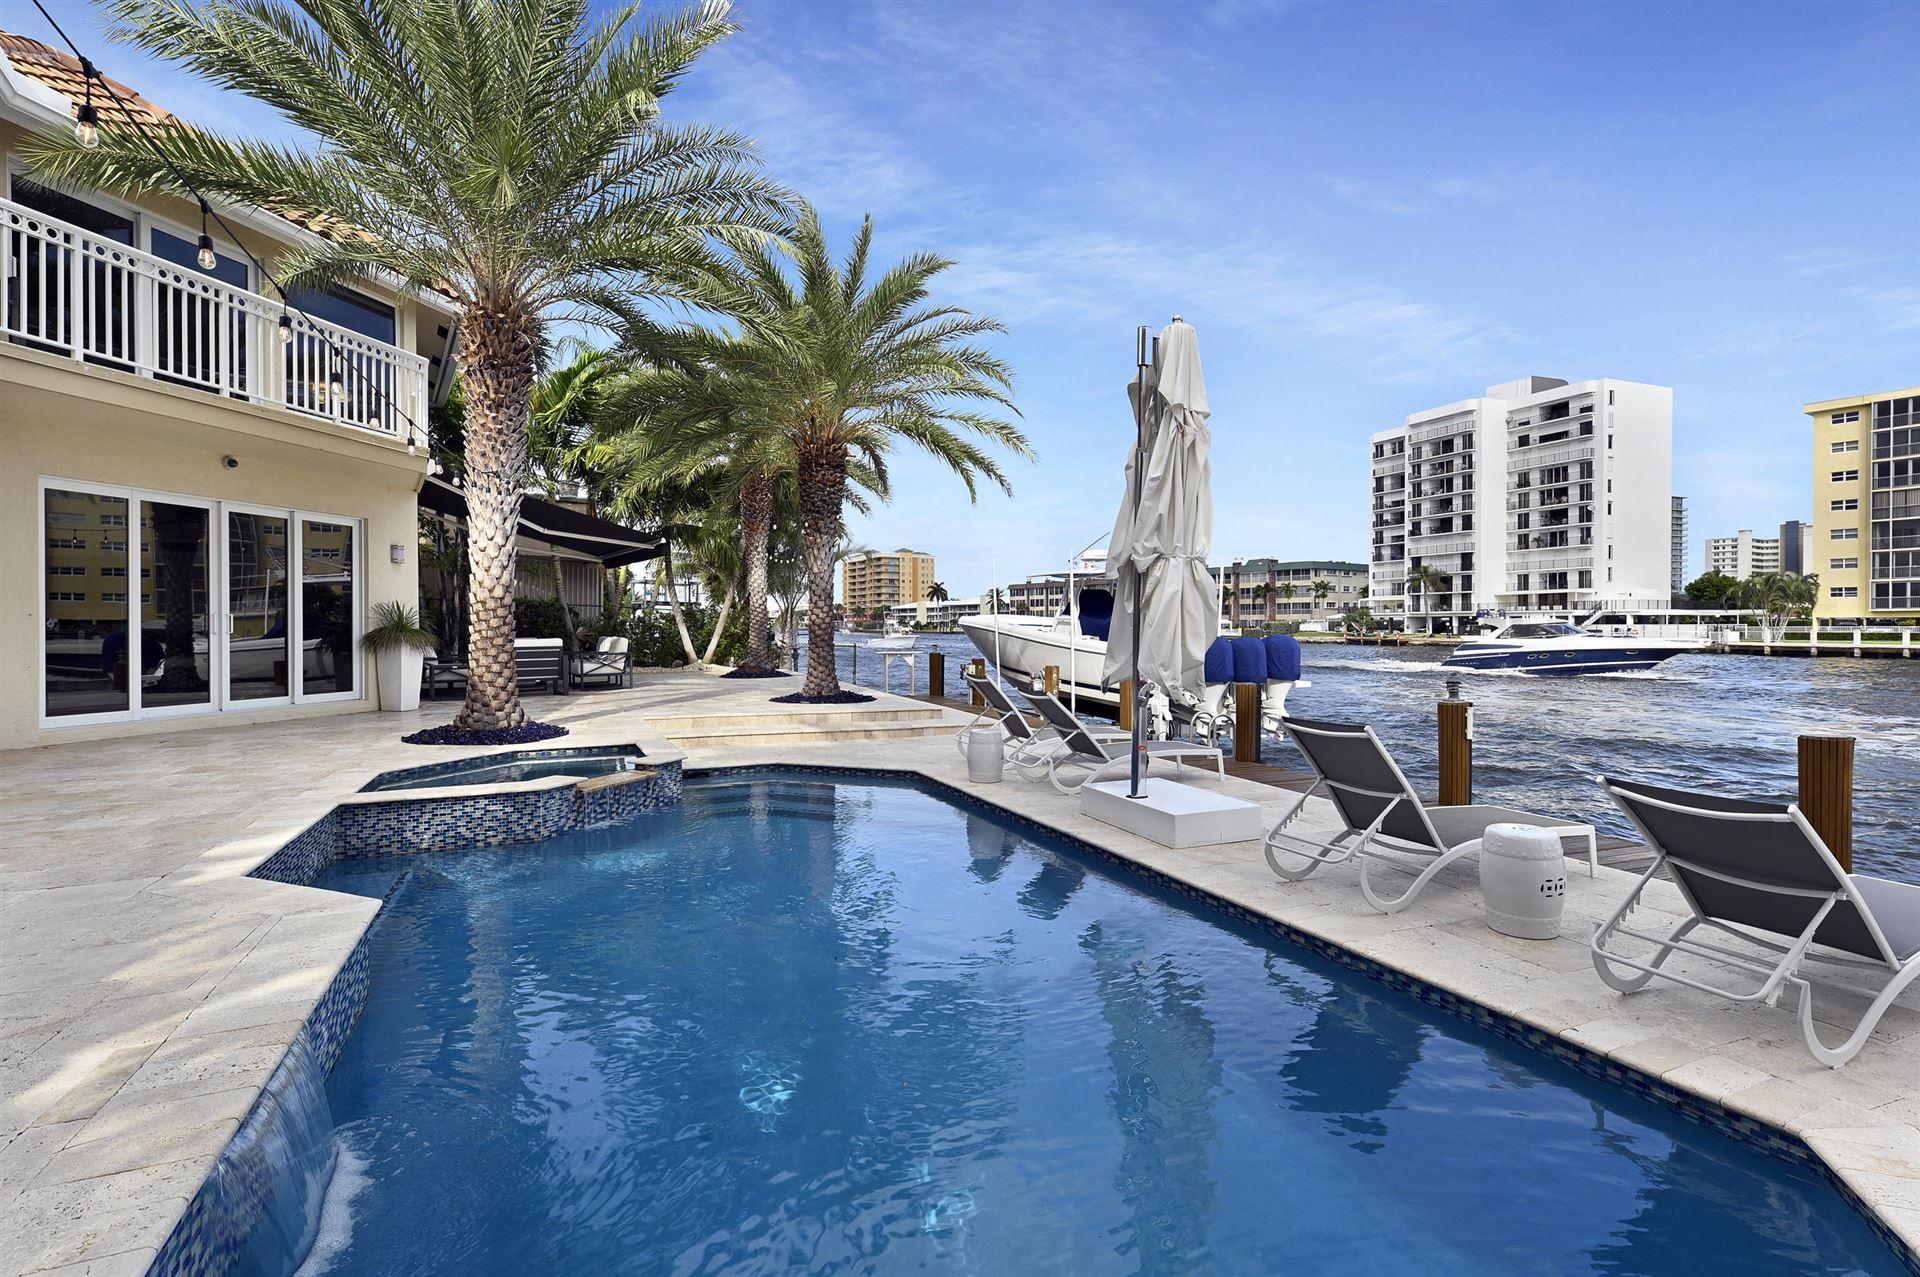 2850 NE 9th Court, Pompano Beach, FL 33062 - #: RX-10581025